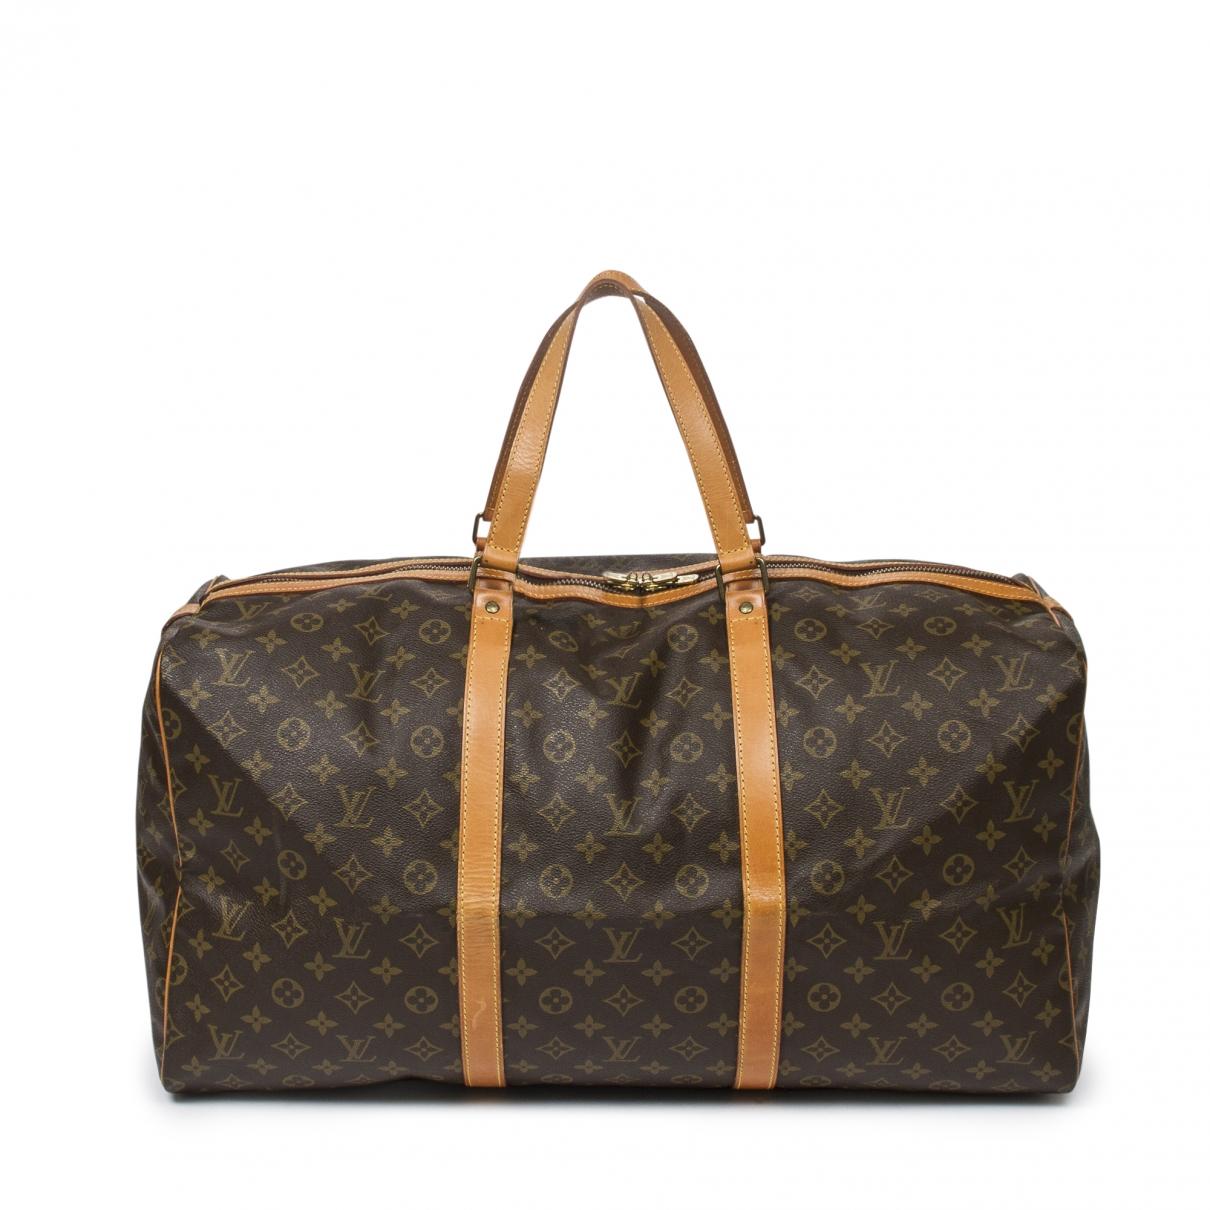 Louis Vuitton Sac souple  Brown Cotton handbag for Women \N